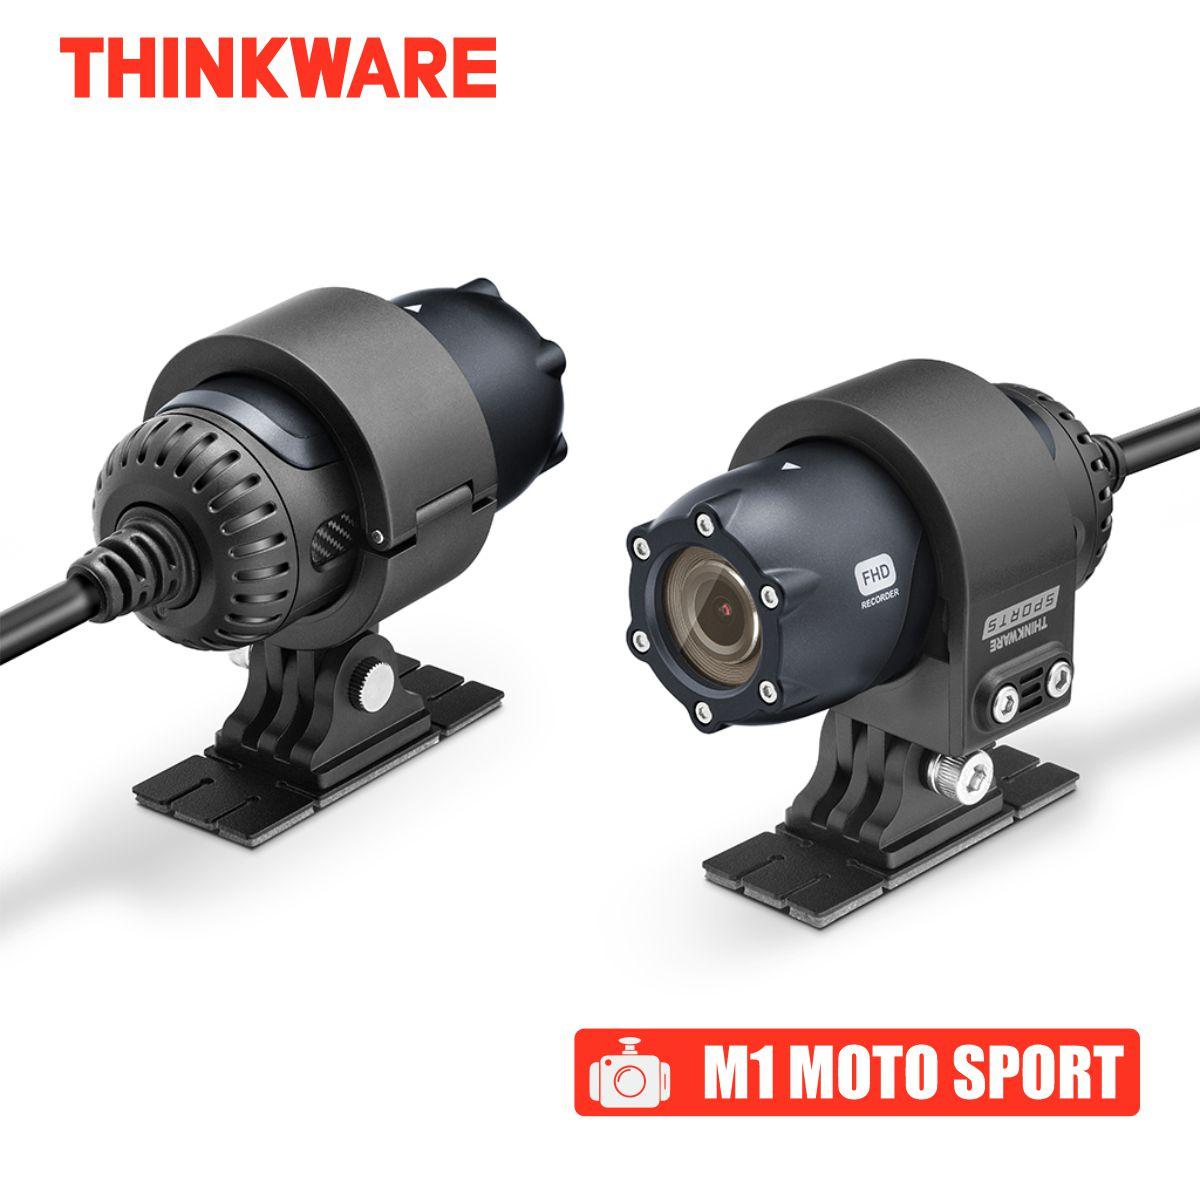 https://techauto.es/producto/m1-motosport/